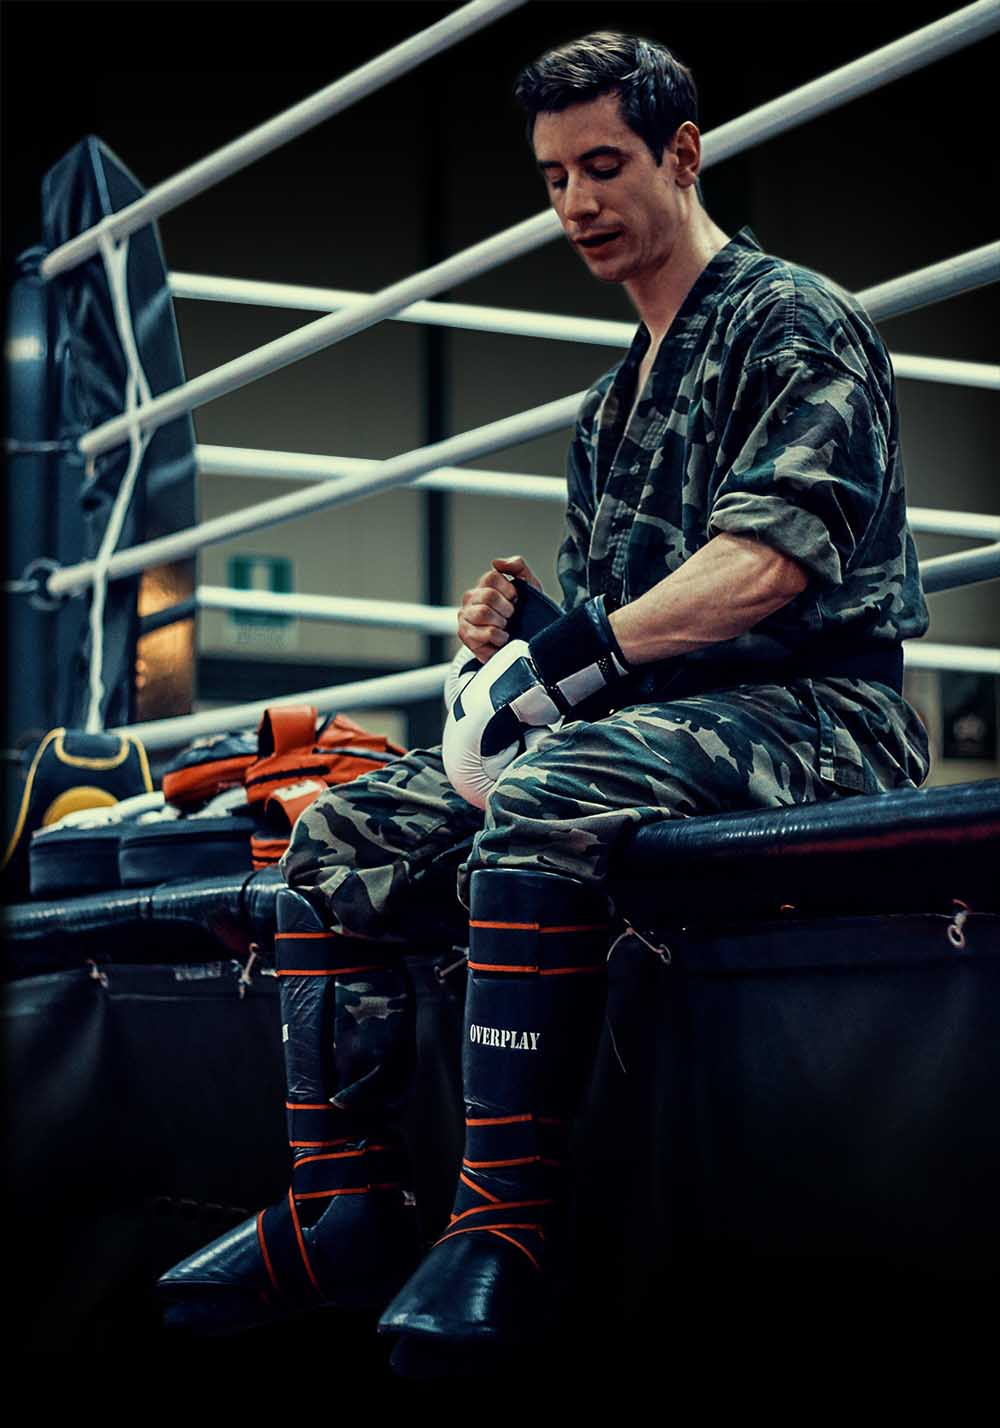 Krav Maga Training ready to fight